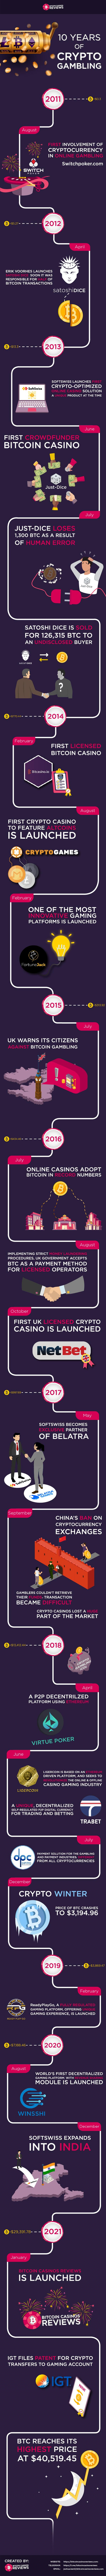 Bitcoin Gambling Infographic